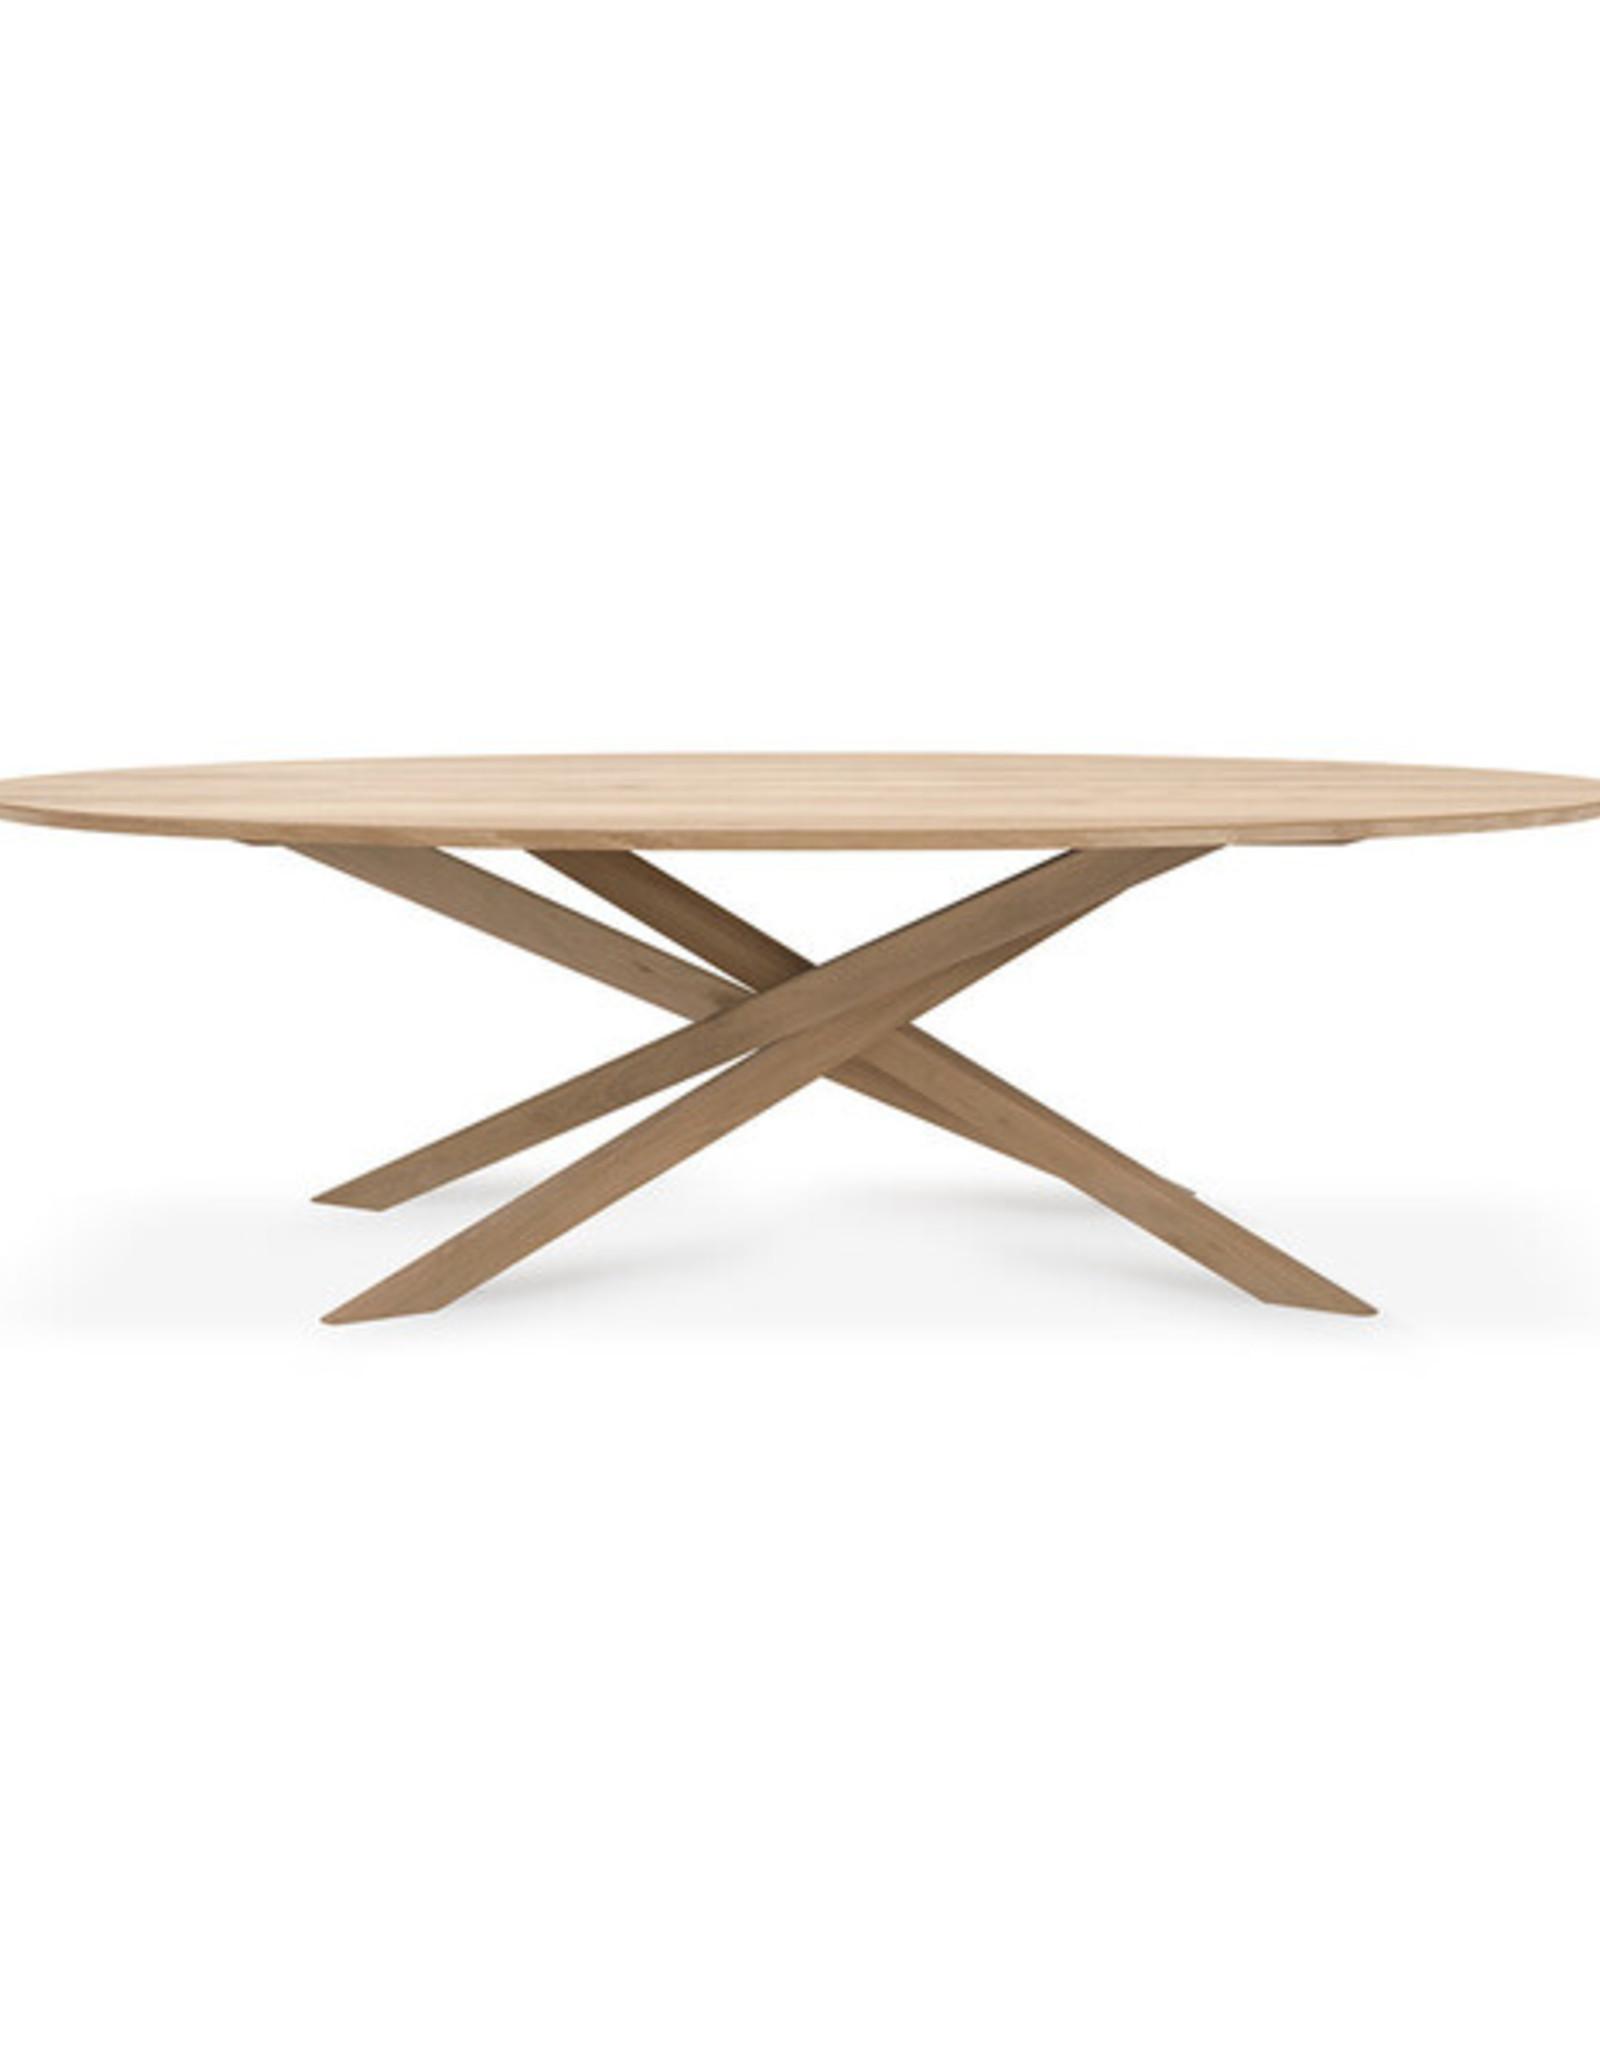 Oak Mikado dining table - oval